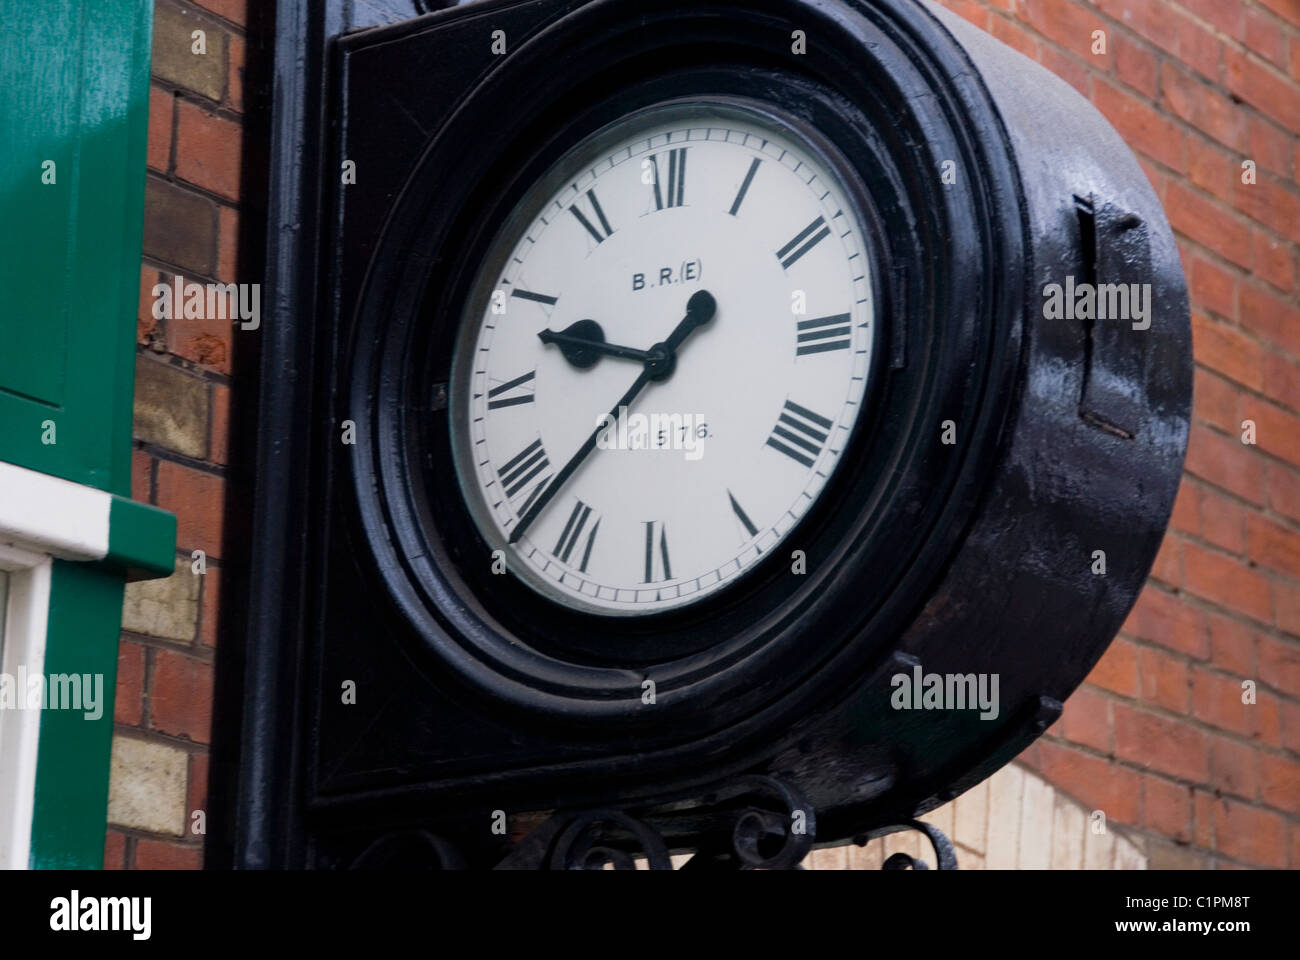 England, Norfolk, Sheringham Railway Station clock - Stock Image